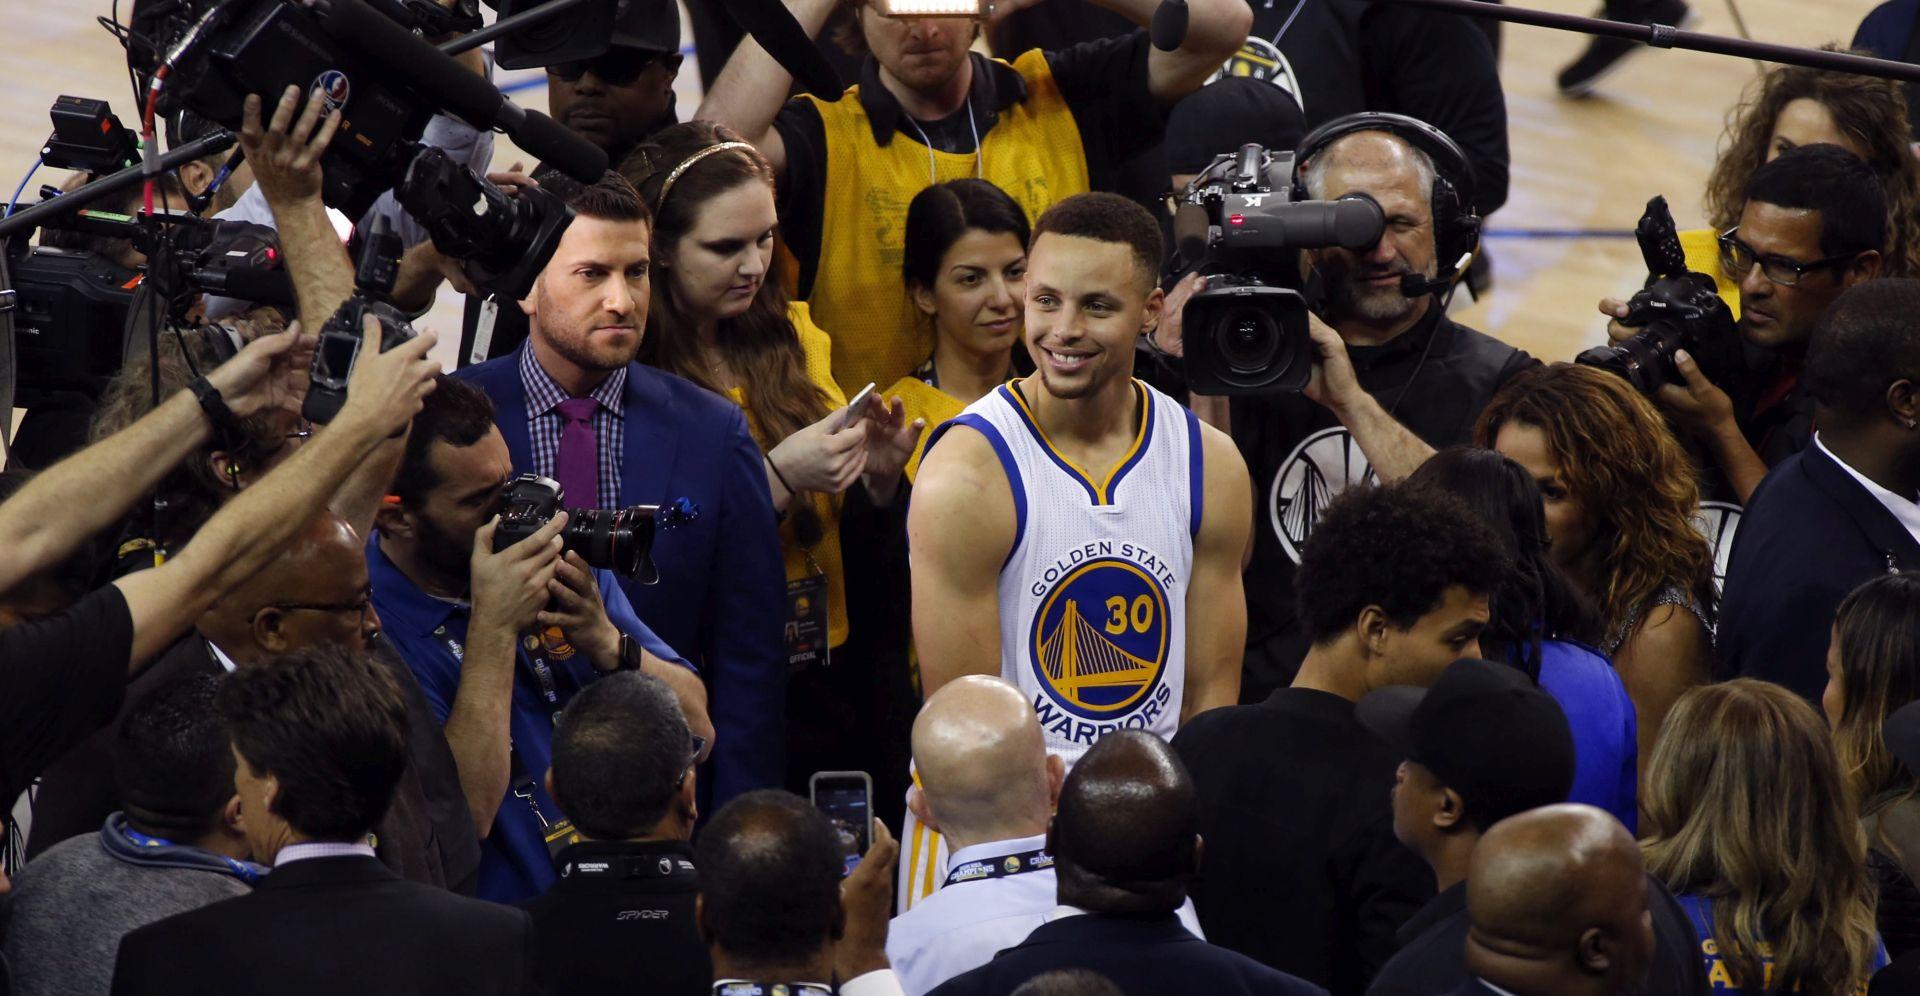 VIDEO: NOĆ ZA PAMĆENJE Warriorsi srušili rekord Bullsa, Curry prešao brojku od 400 trica